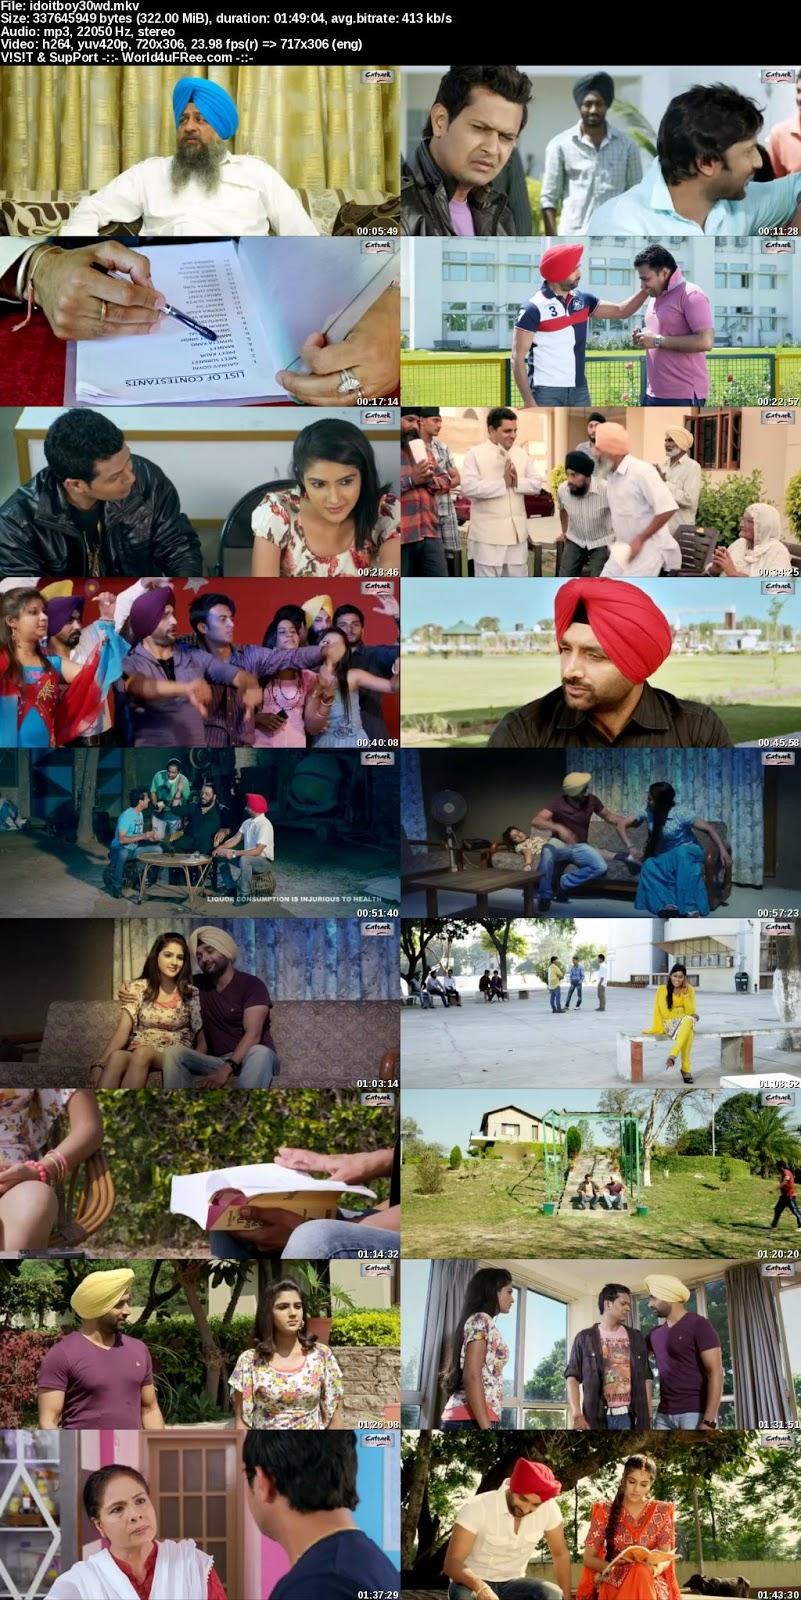 idoitboy30wd s Idiot Boys (2014) Punjabi Movie Download In 300MB